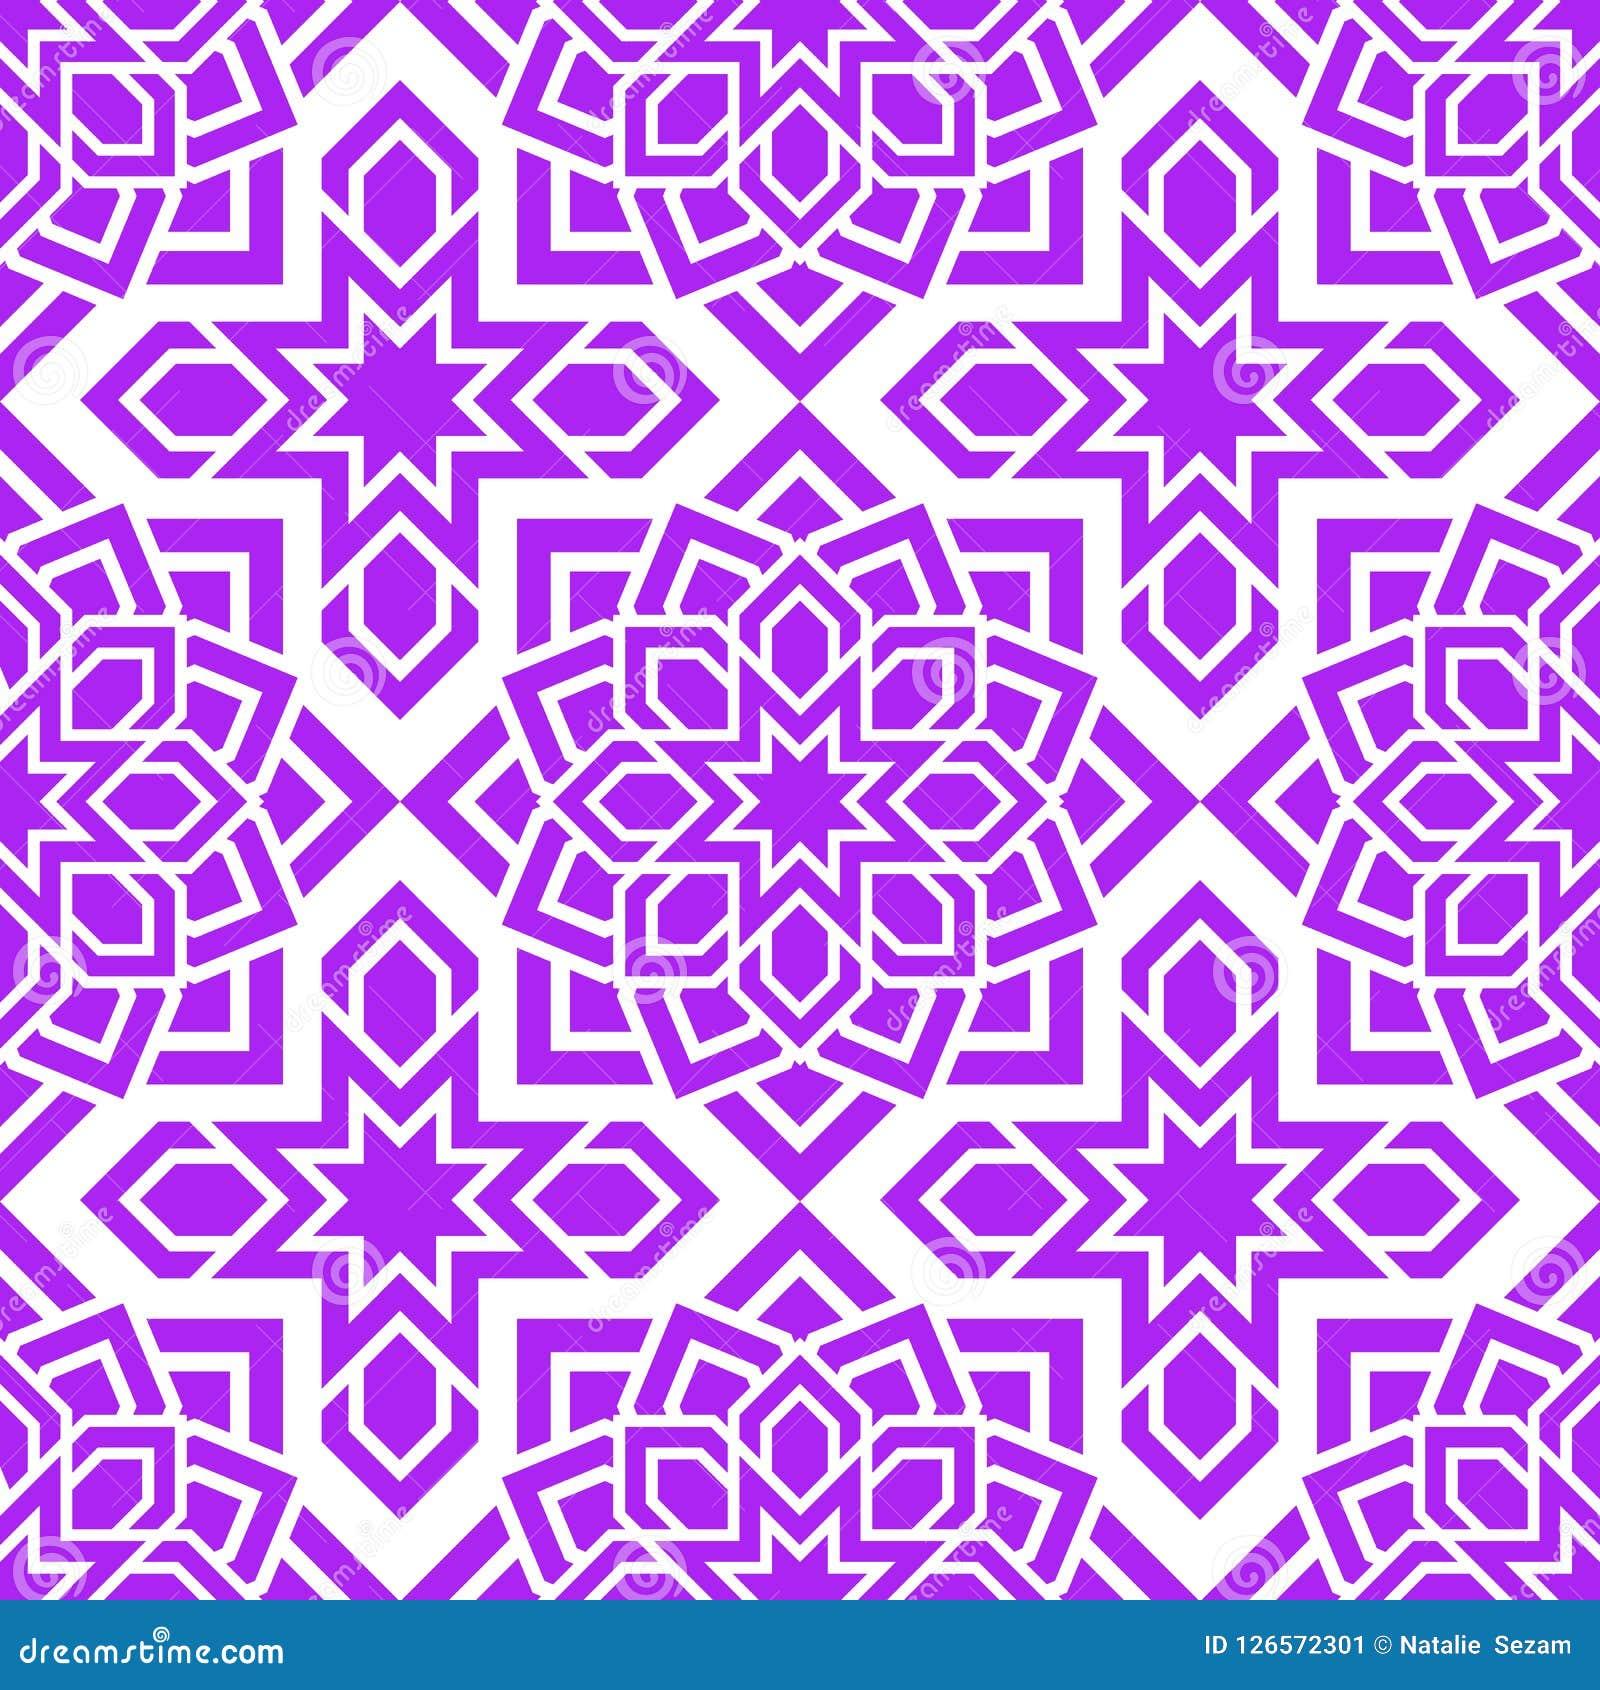 e0bea09e3a9c Arabic seamless pattern. Islamic geometric background. Vector eastern  texture. Flowers decor elements.